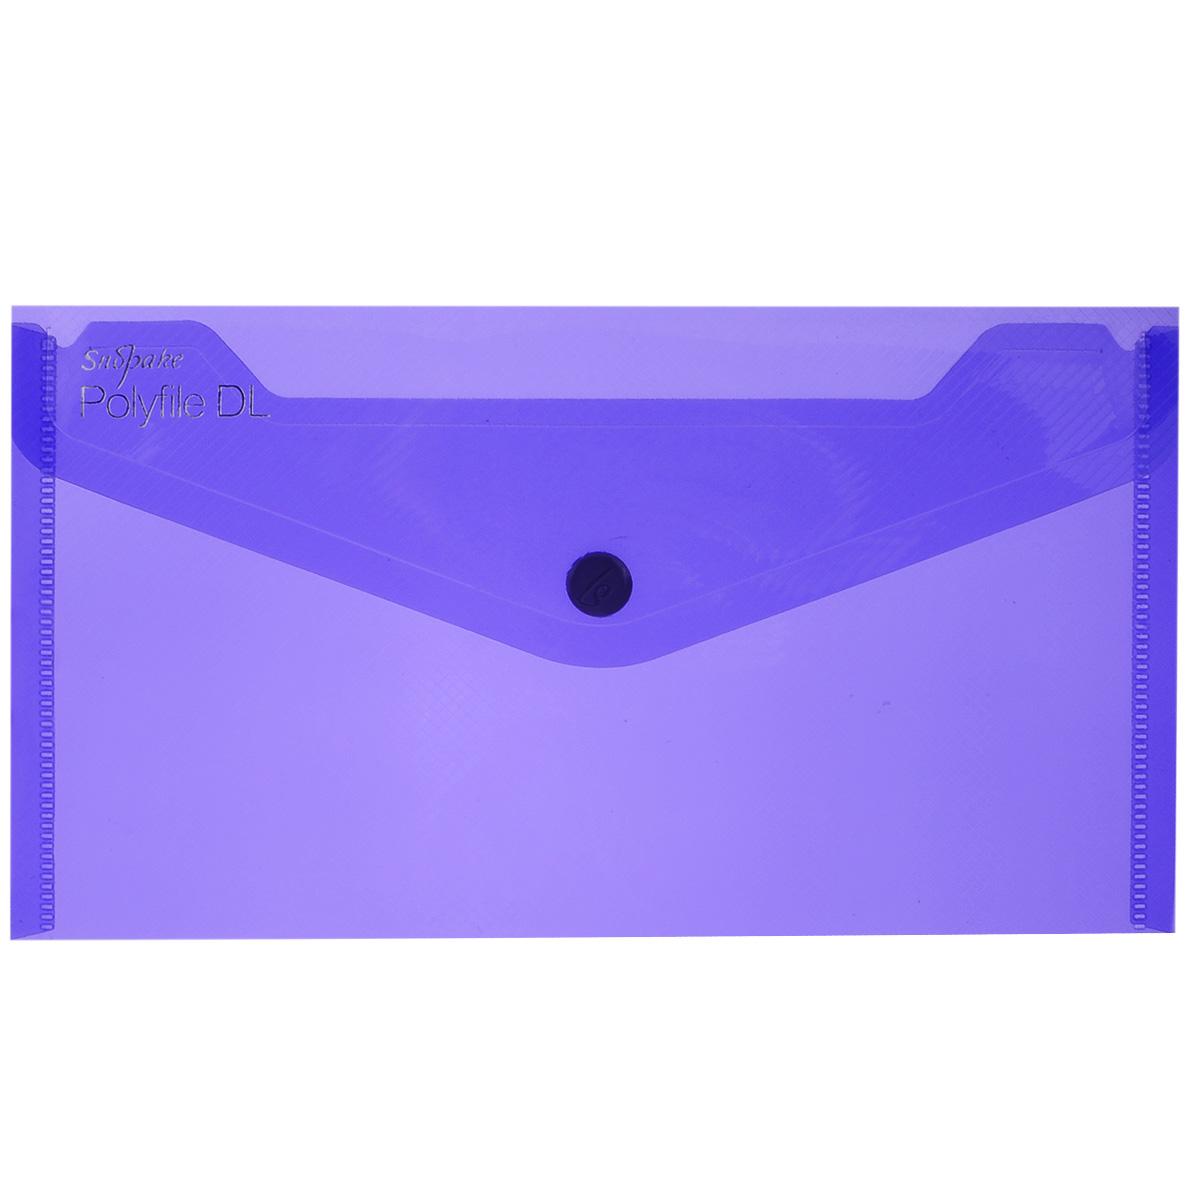 Папка-конверт на кнопке Snopake Polifile DL: Electra, цвет: фиолетовый, формат А5K10035